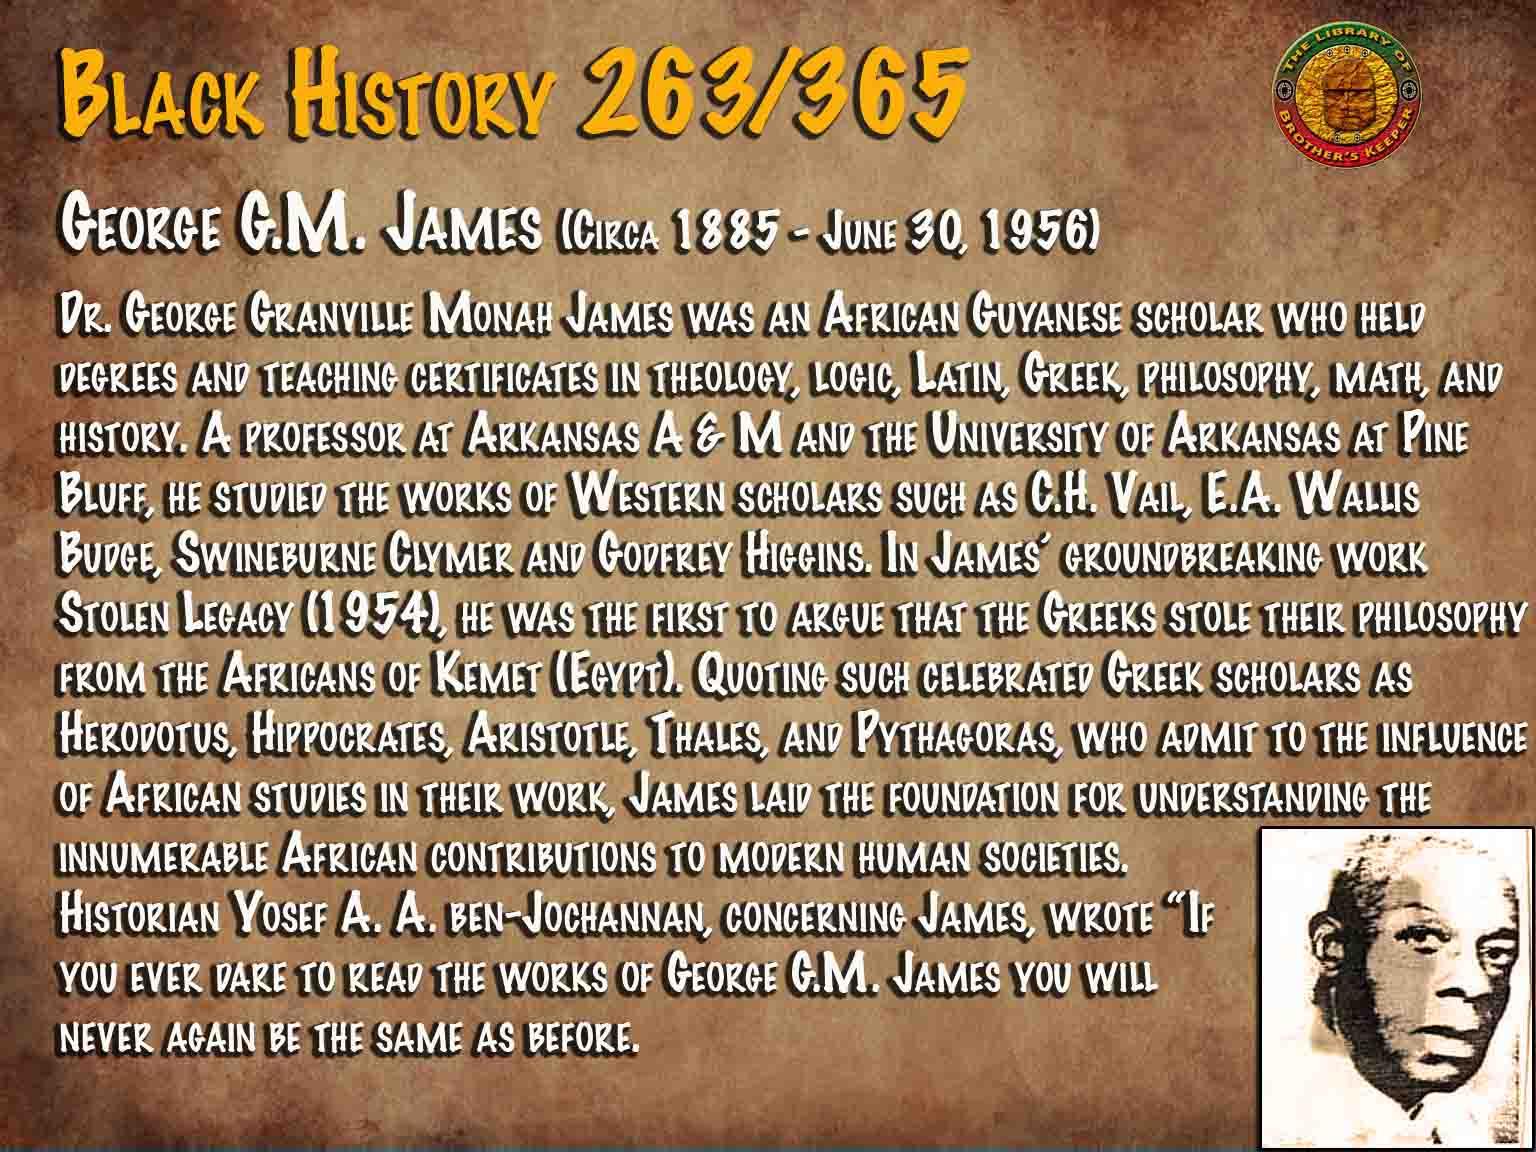 George G.M. James